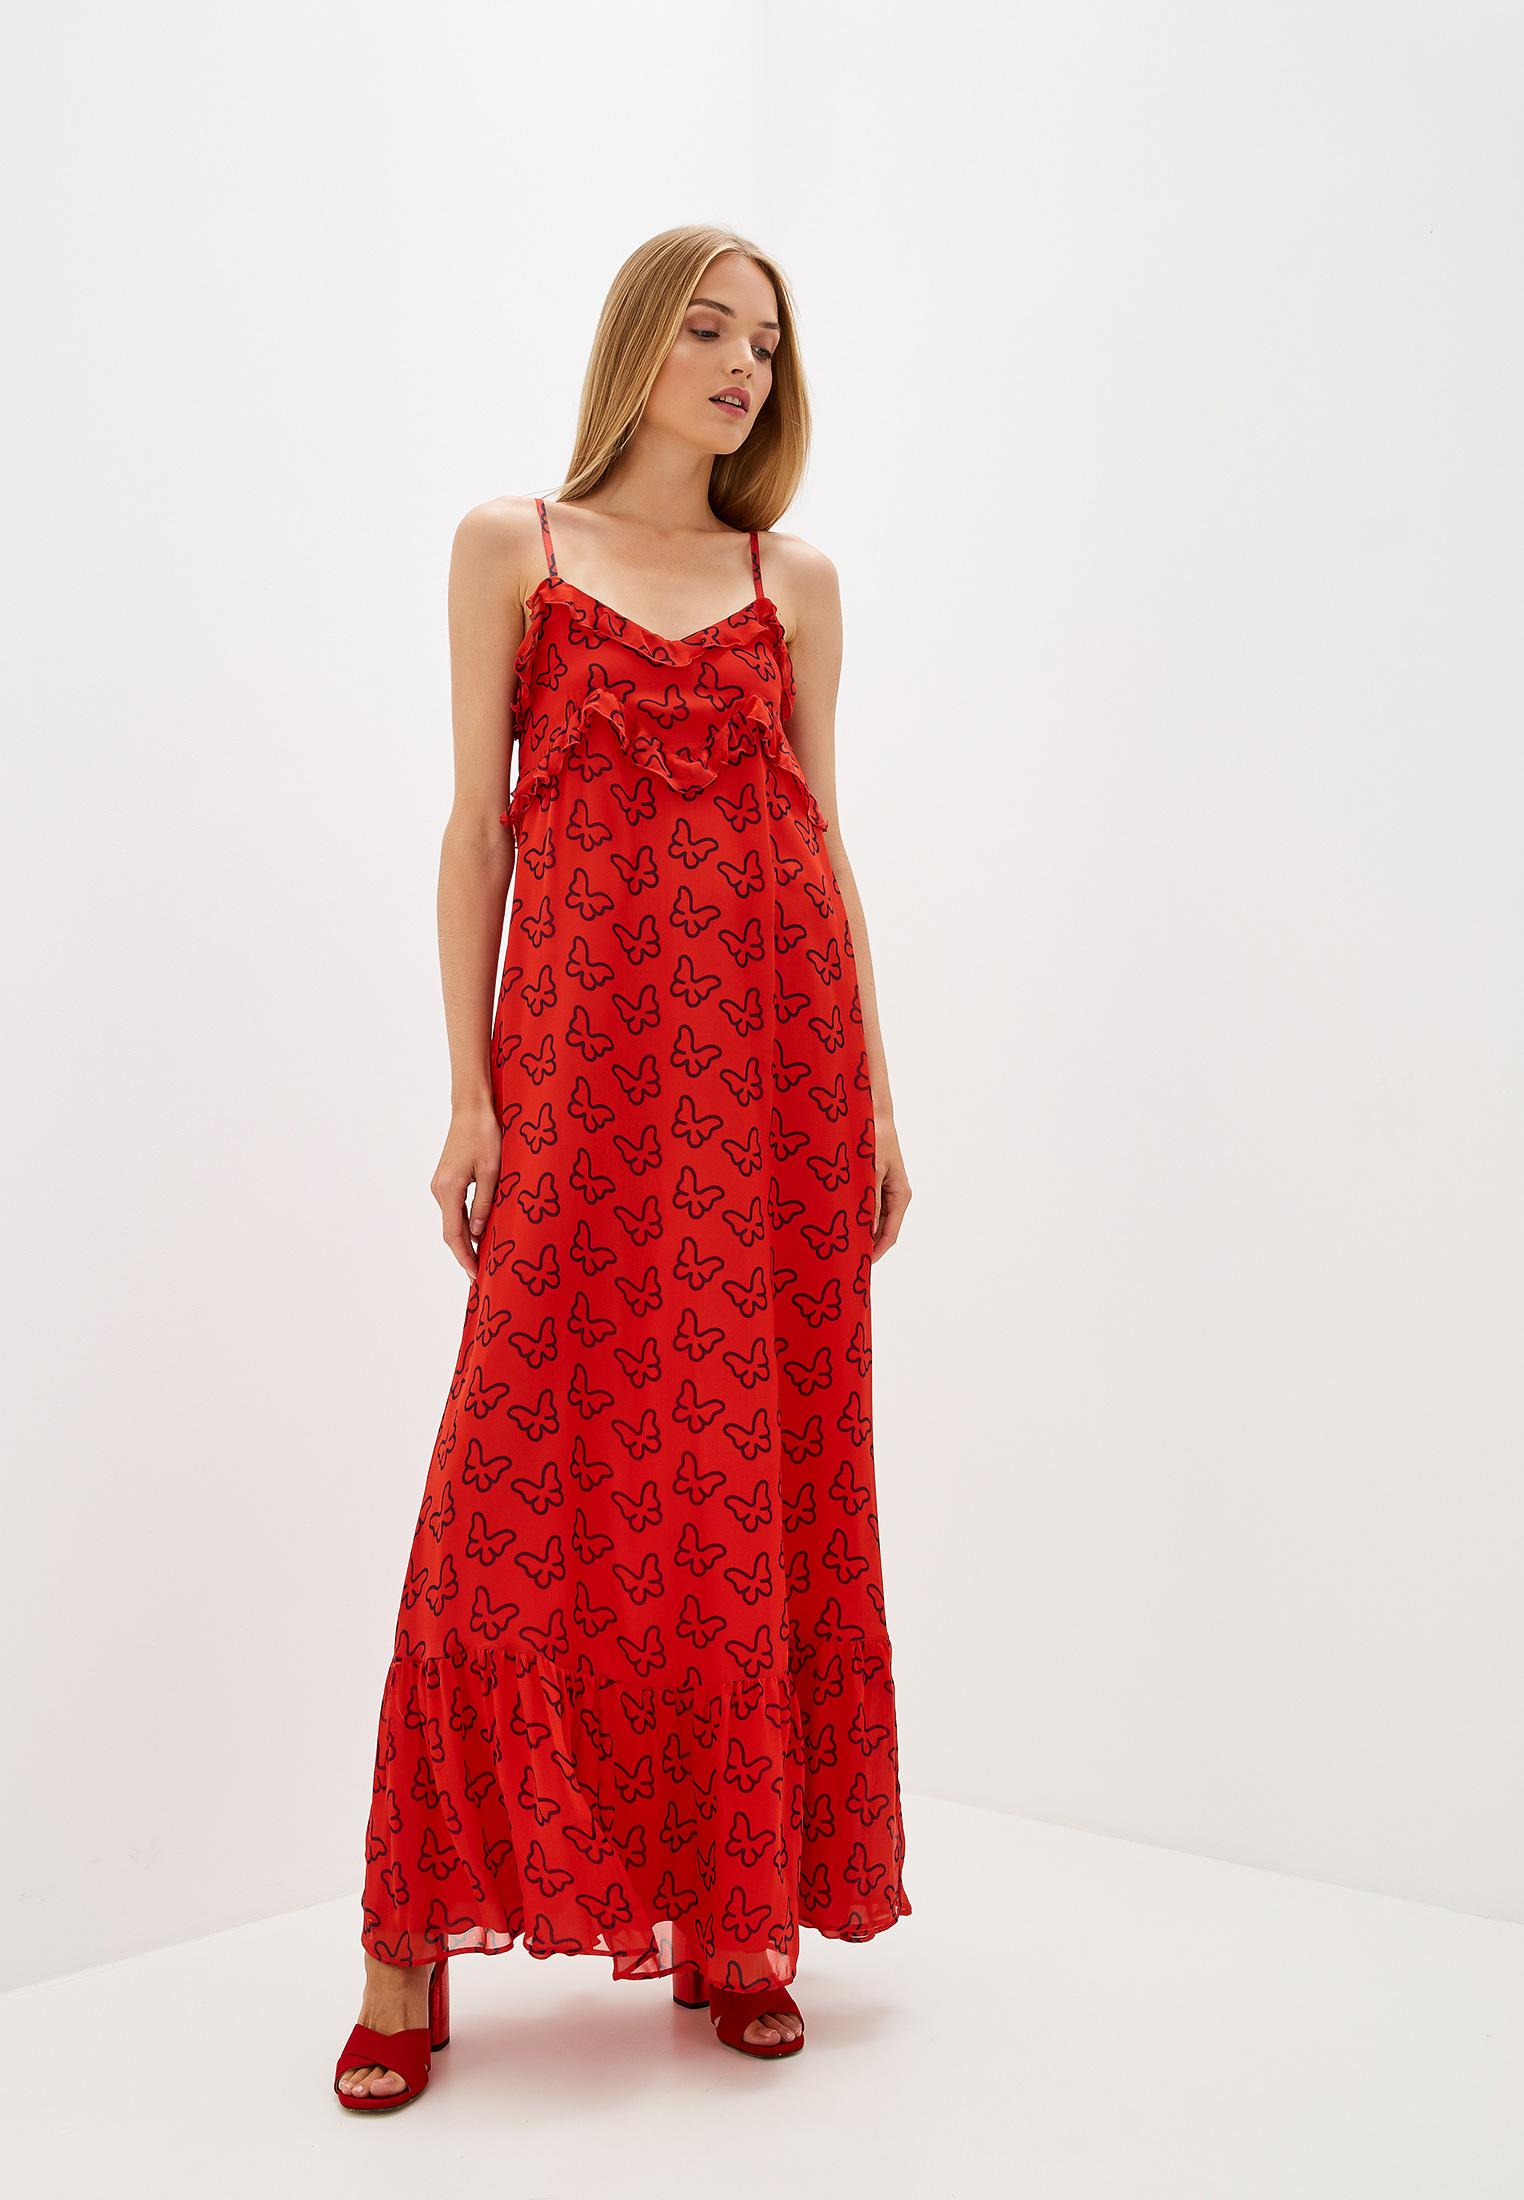 Женские платья-сарафаны Blugirl Folies 3930-6334-1114